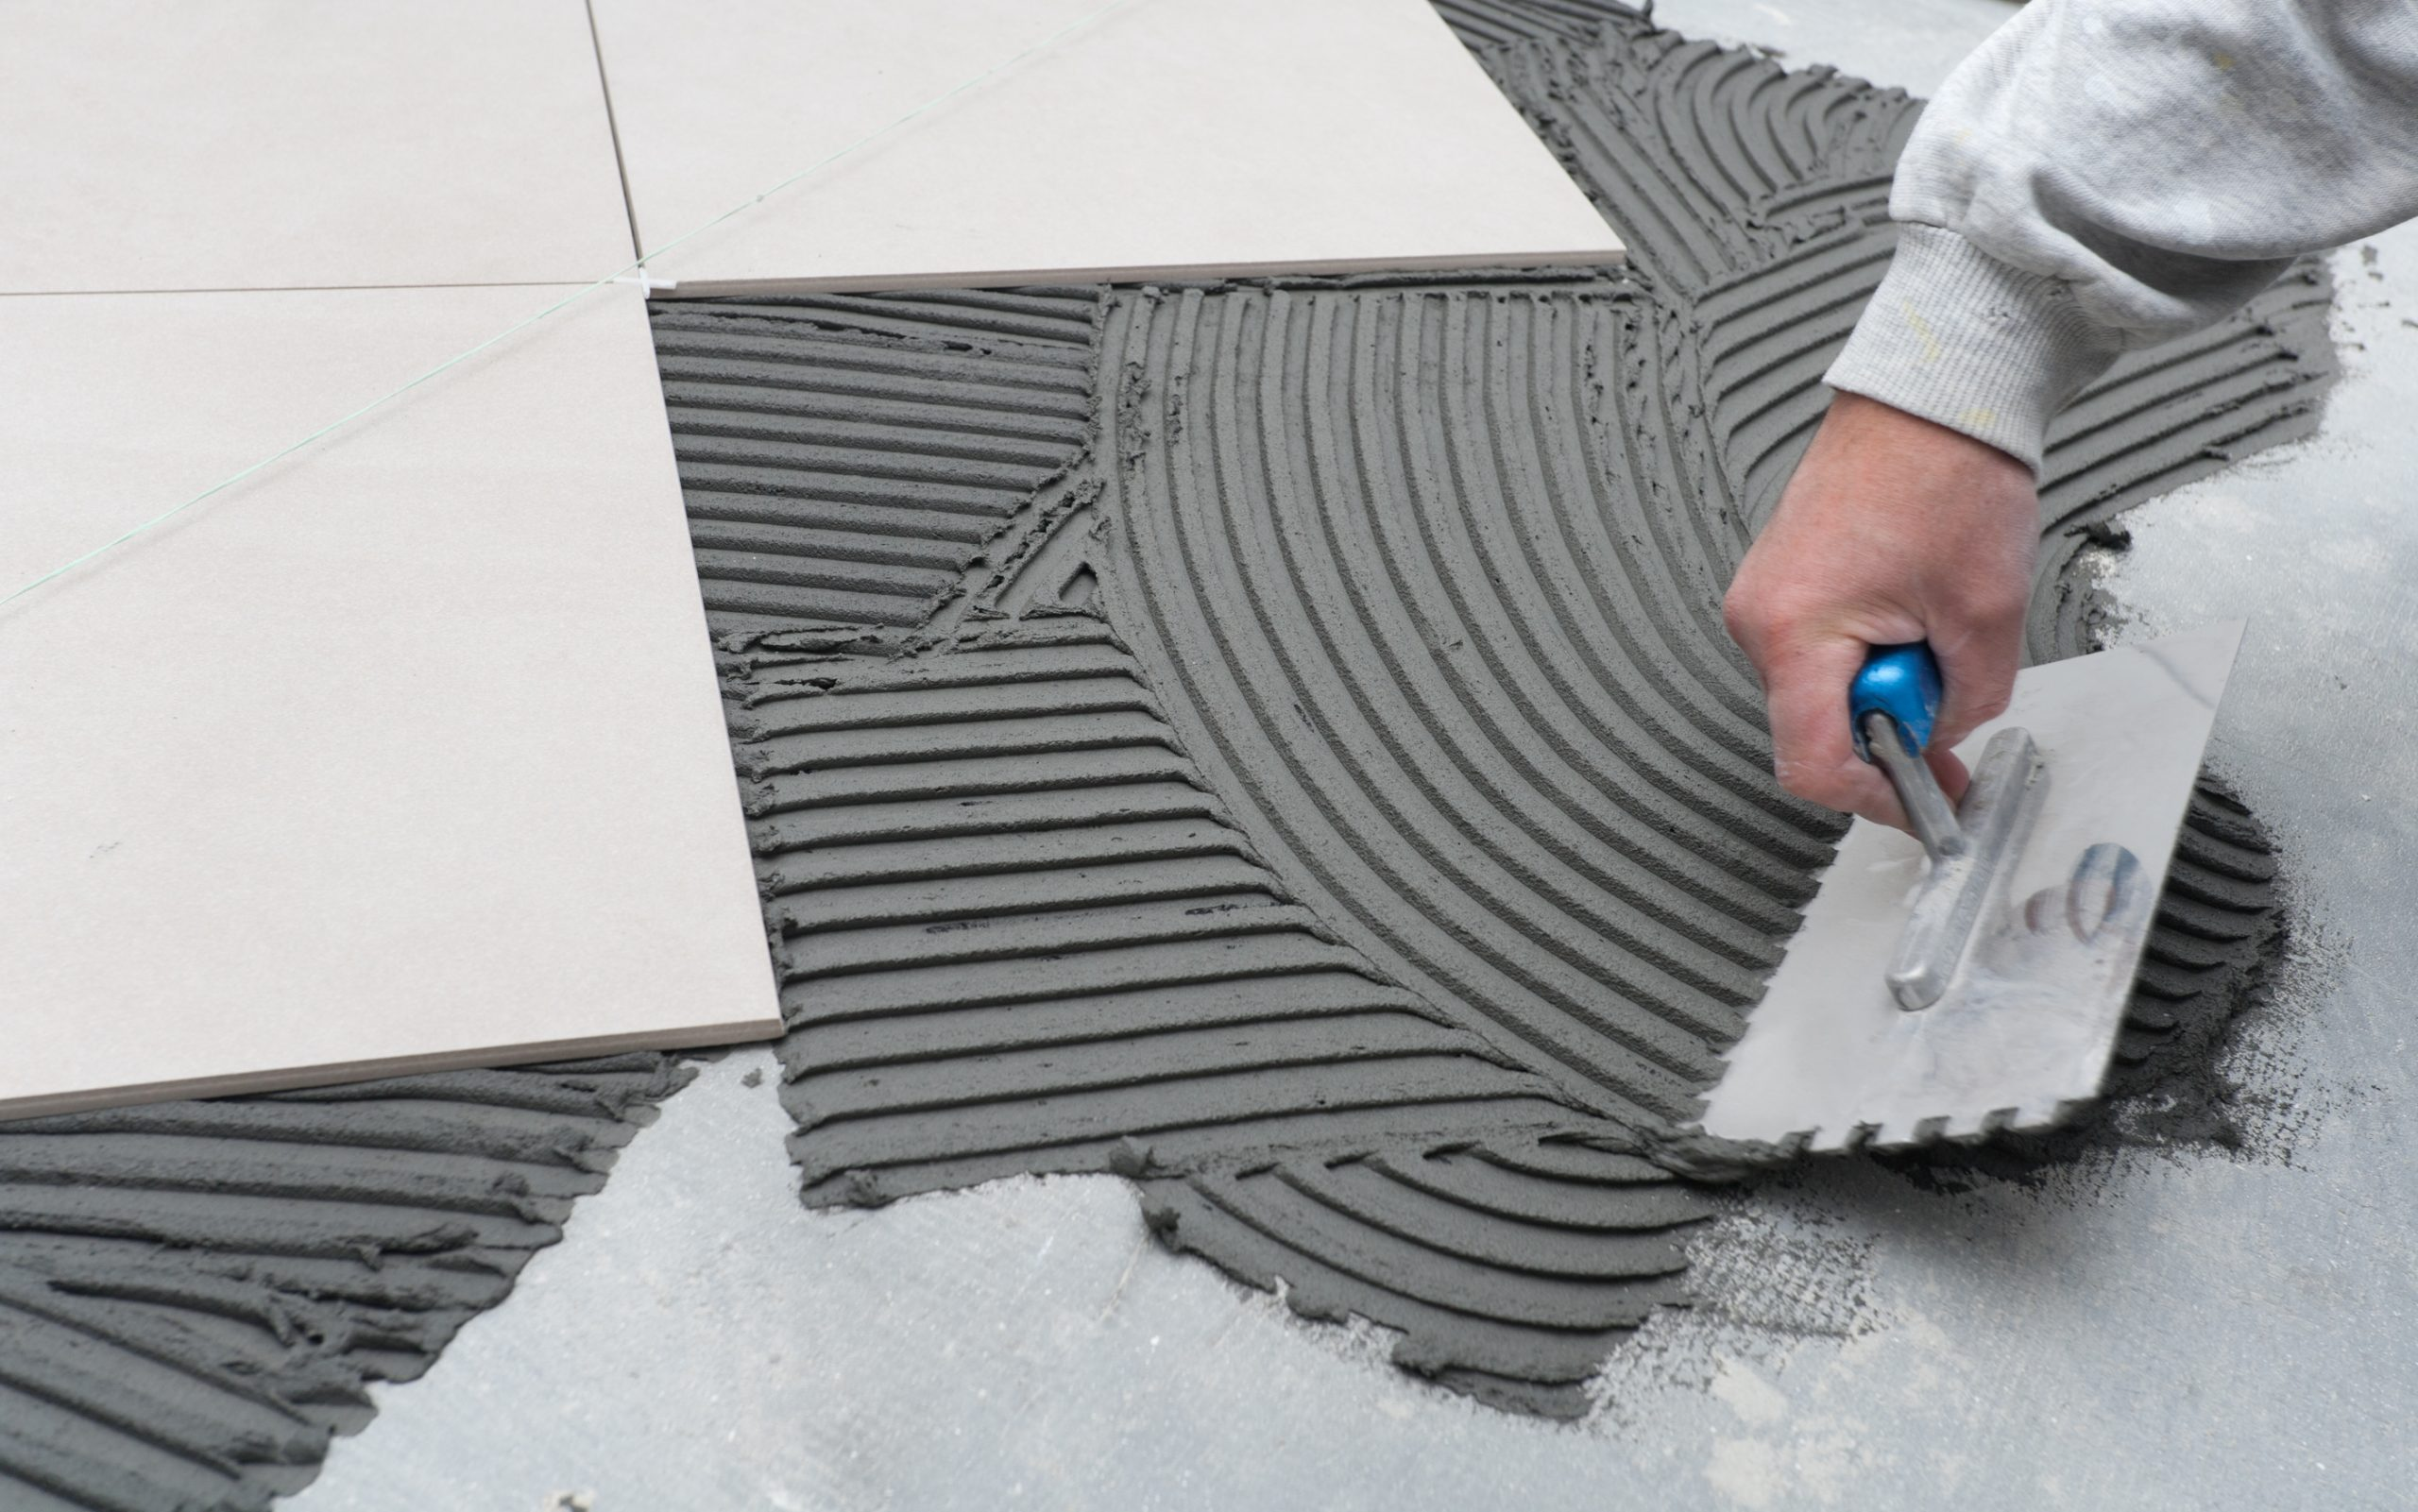 Spreading wet mortar before applying tiles on bathroom floor.